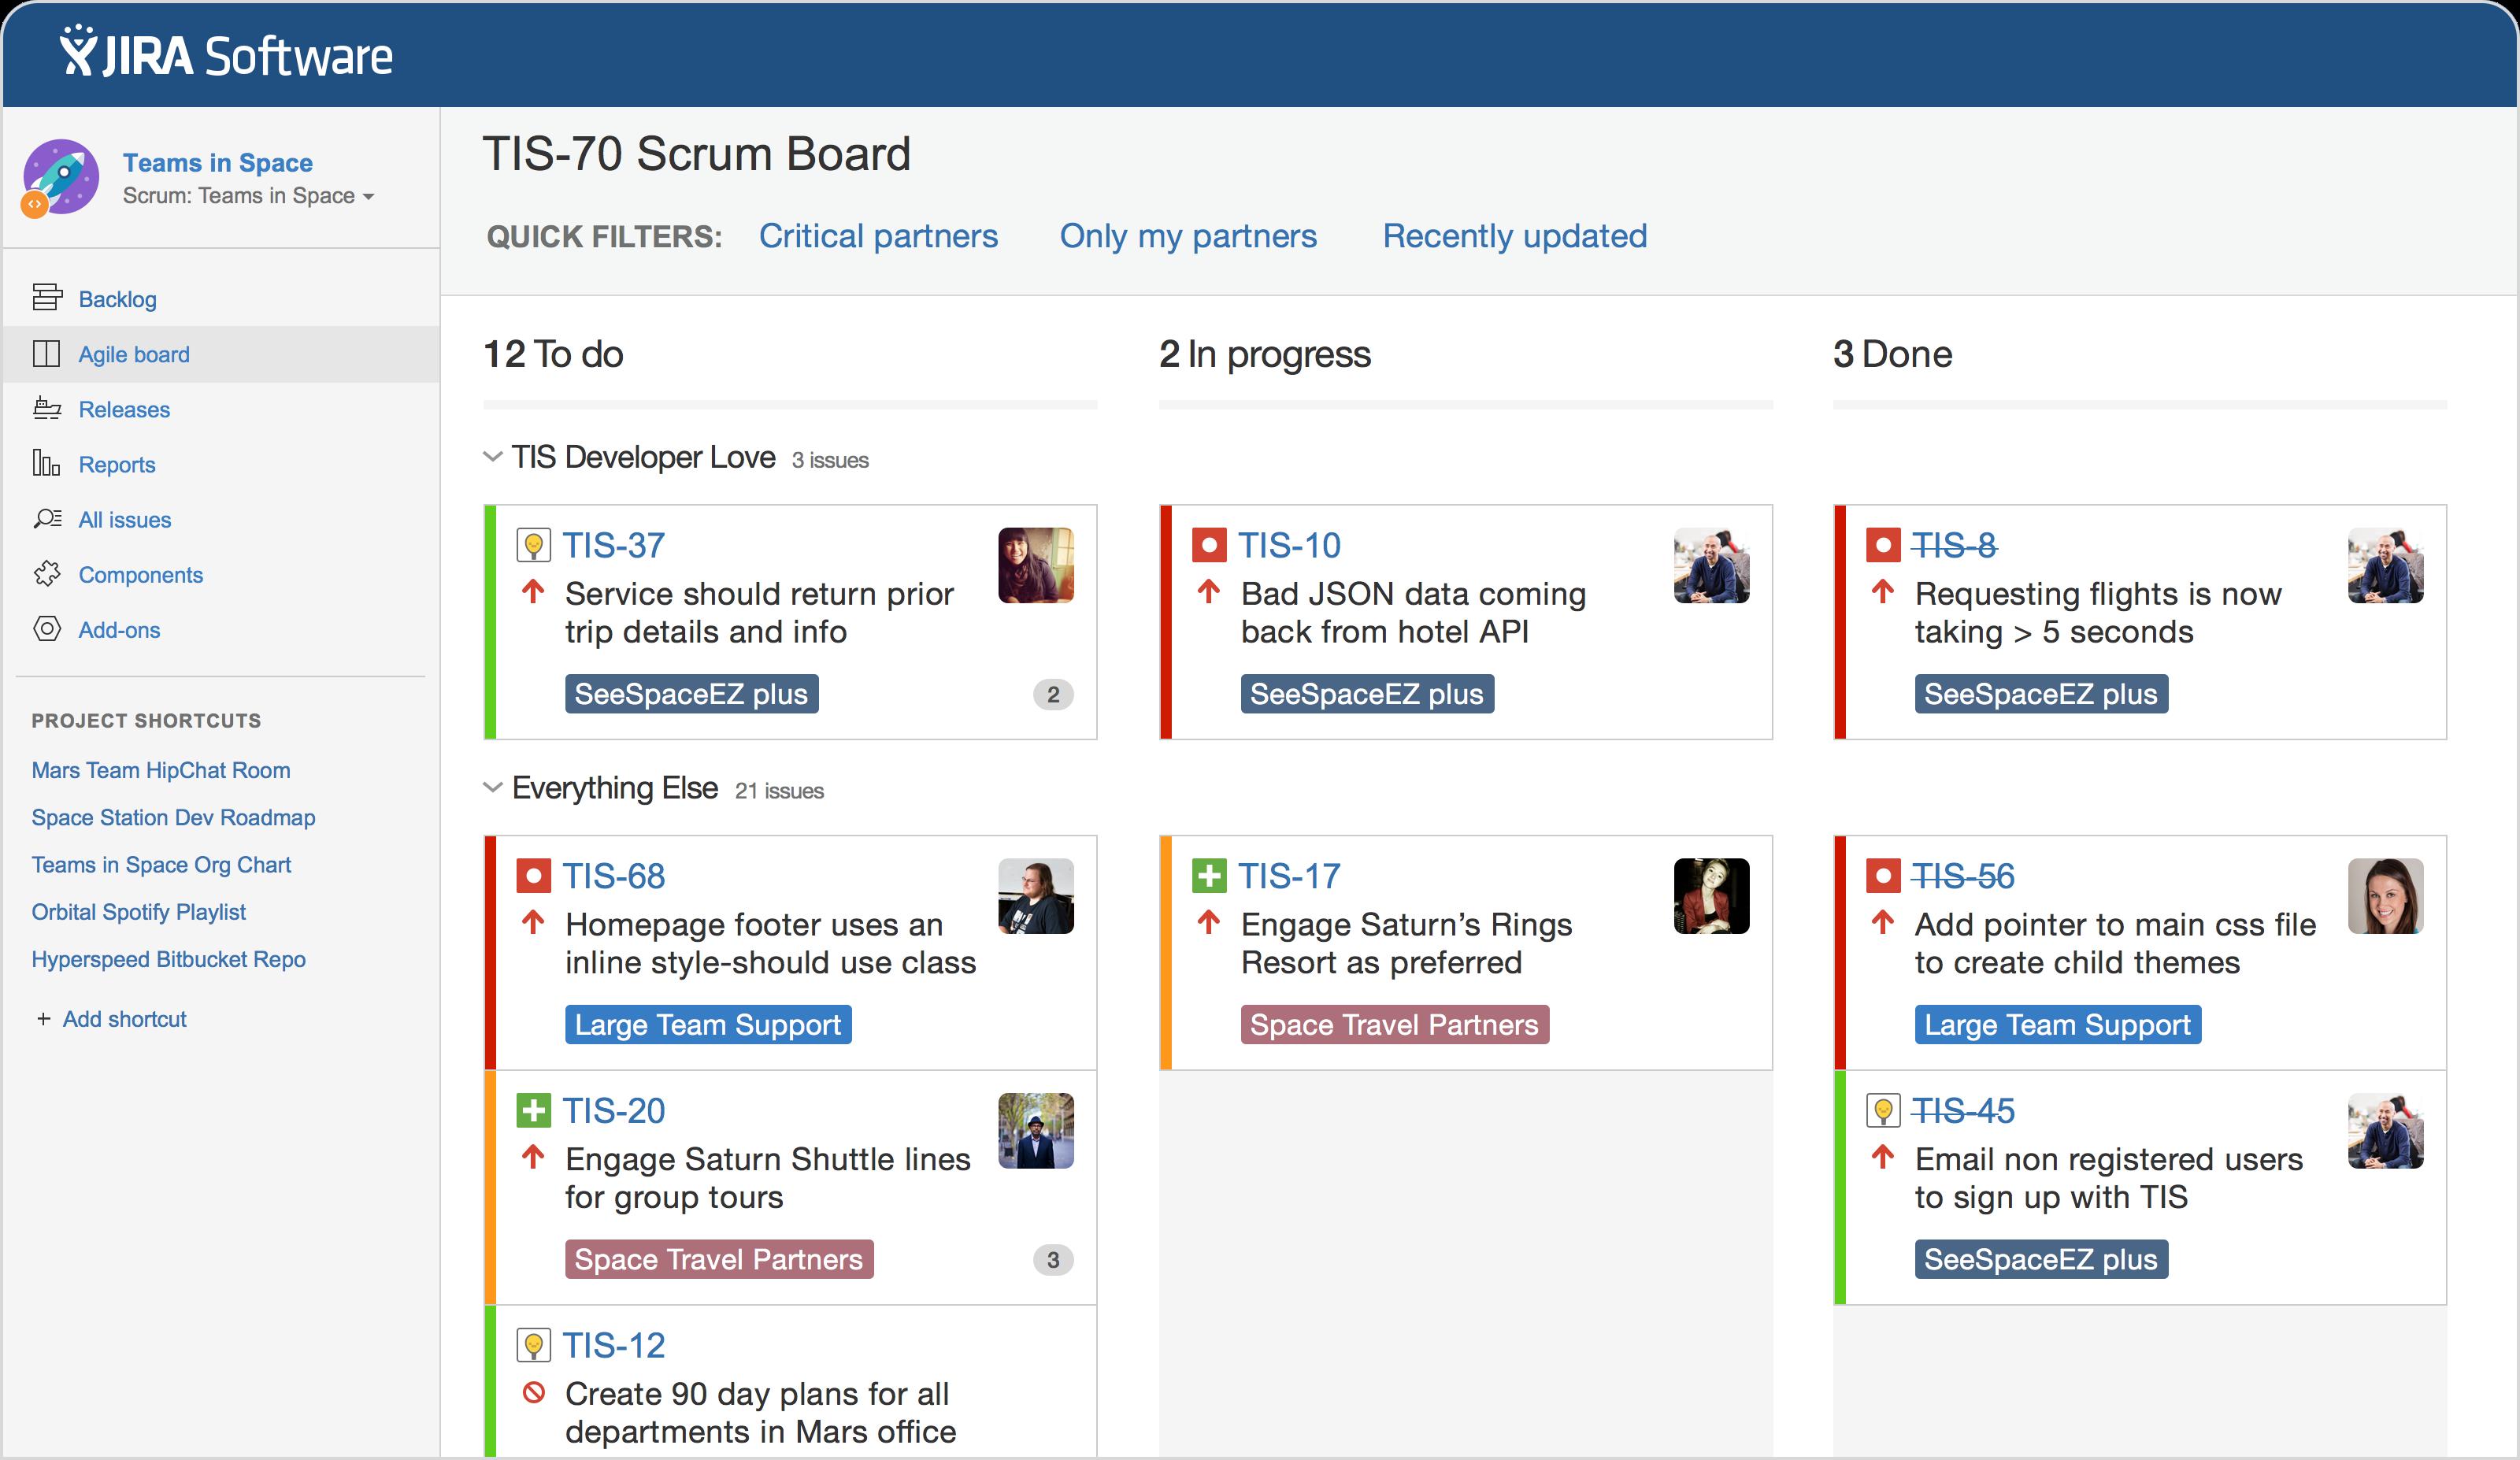 Atlassian Launches Jira 7 Platform With Three Standalone